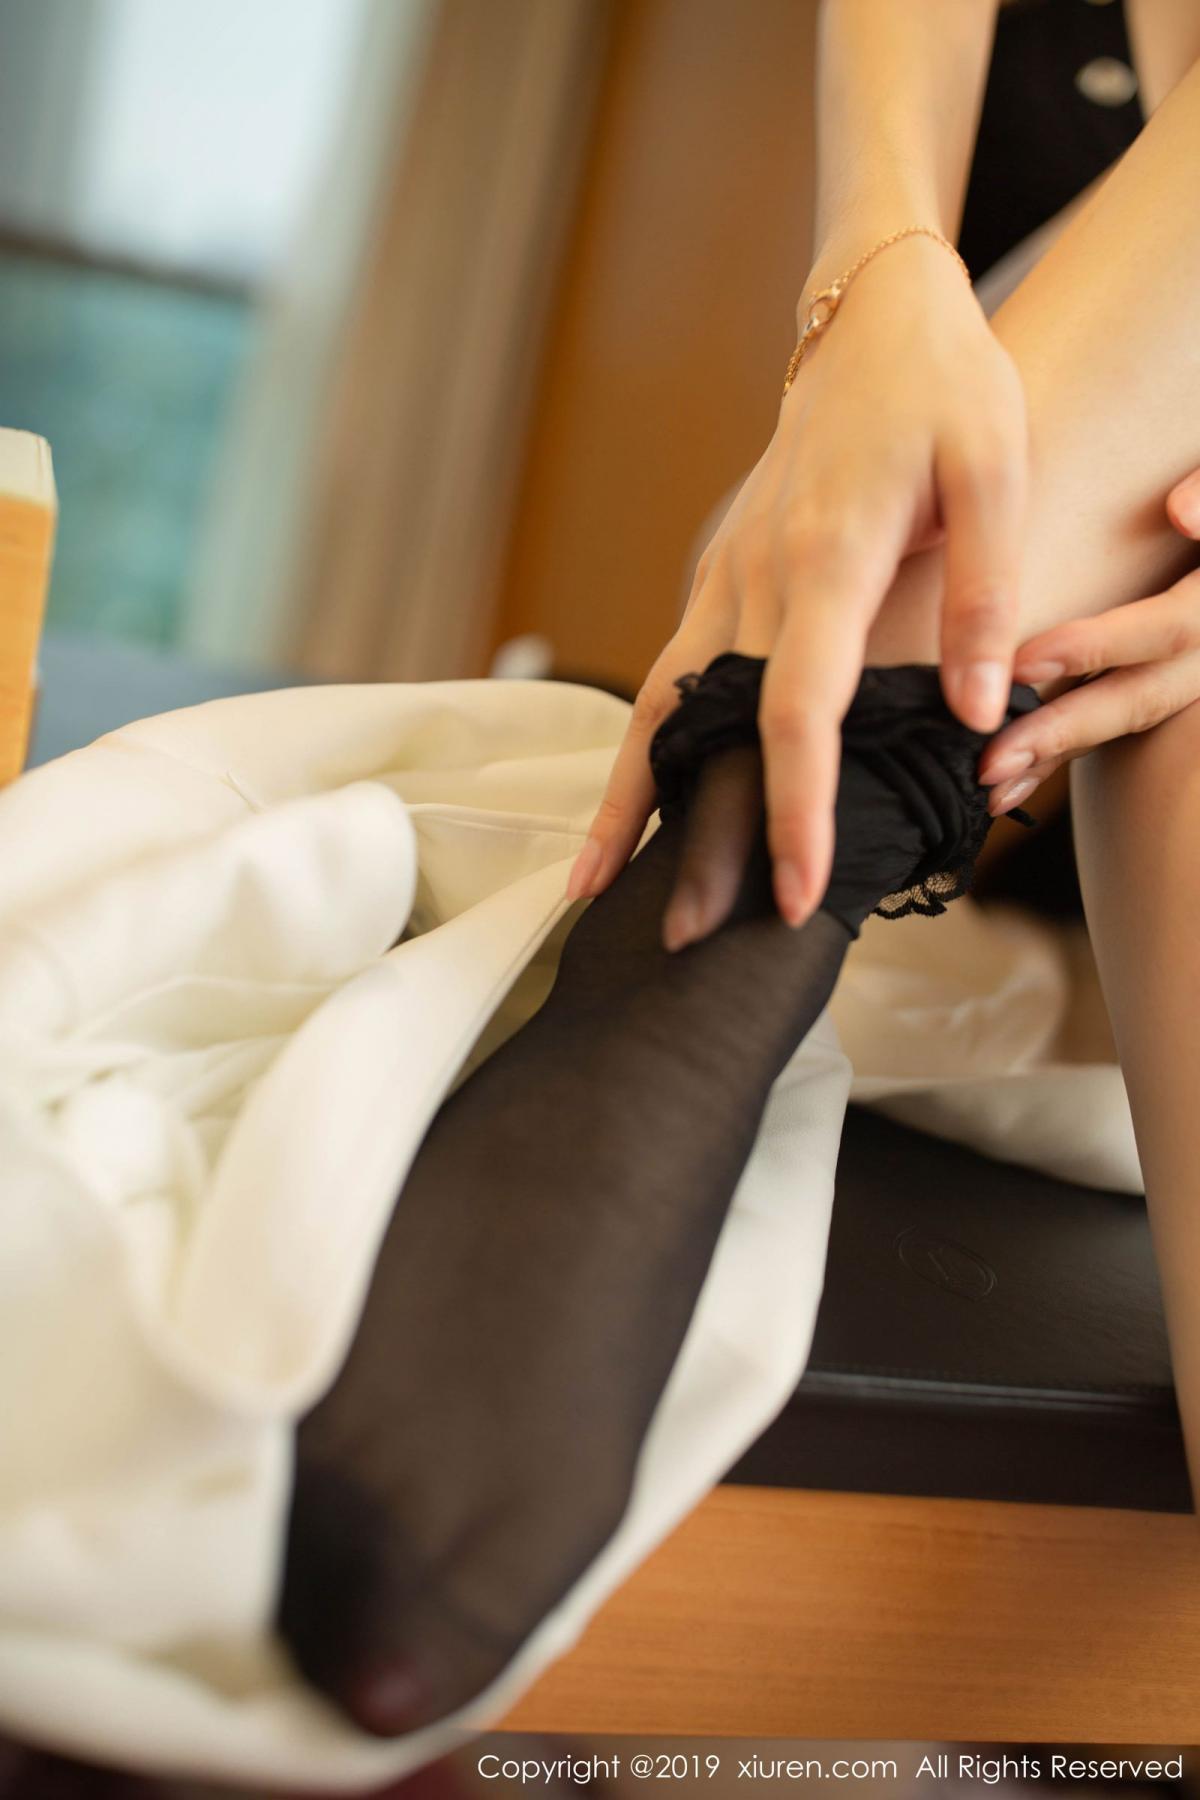 [XiuRen] Vol.1821 Come to my room and sit after you get off work 56P, Black Silk, Di Yi, Xiuren